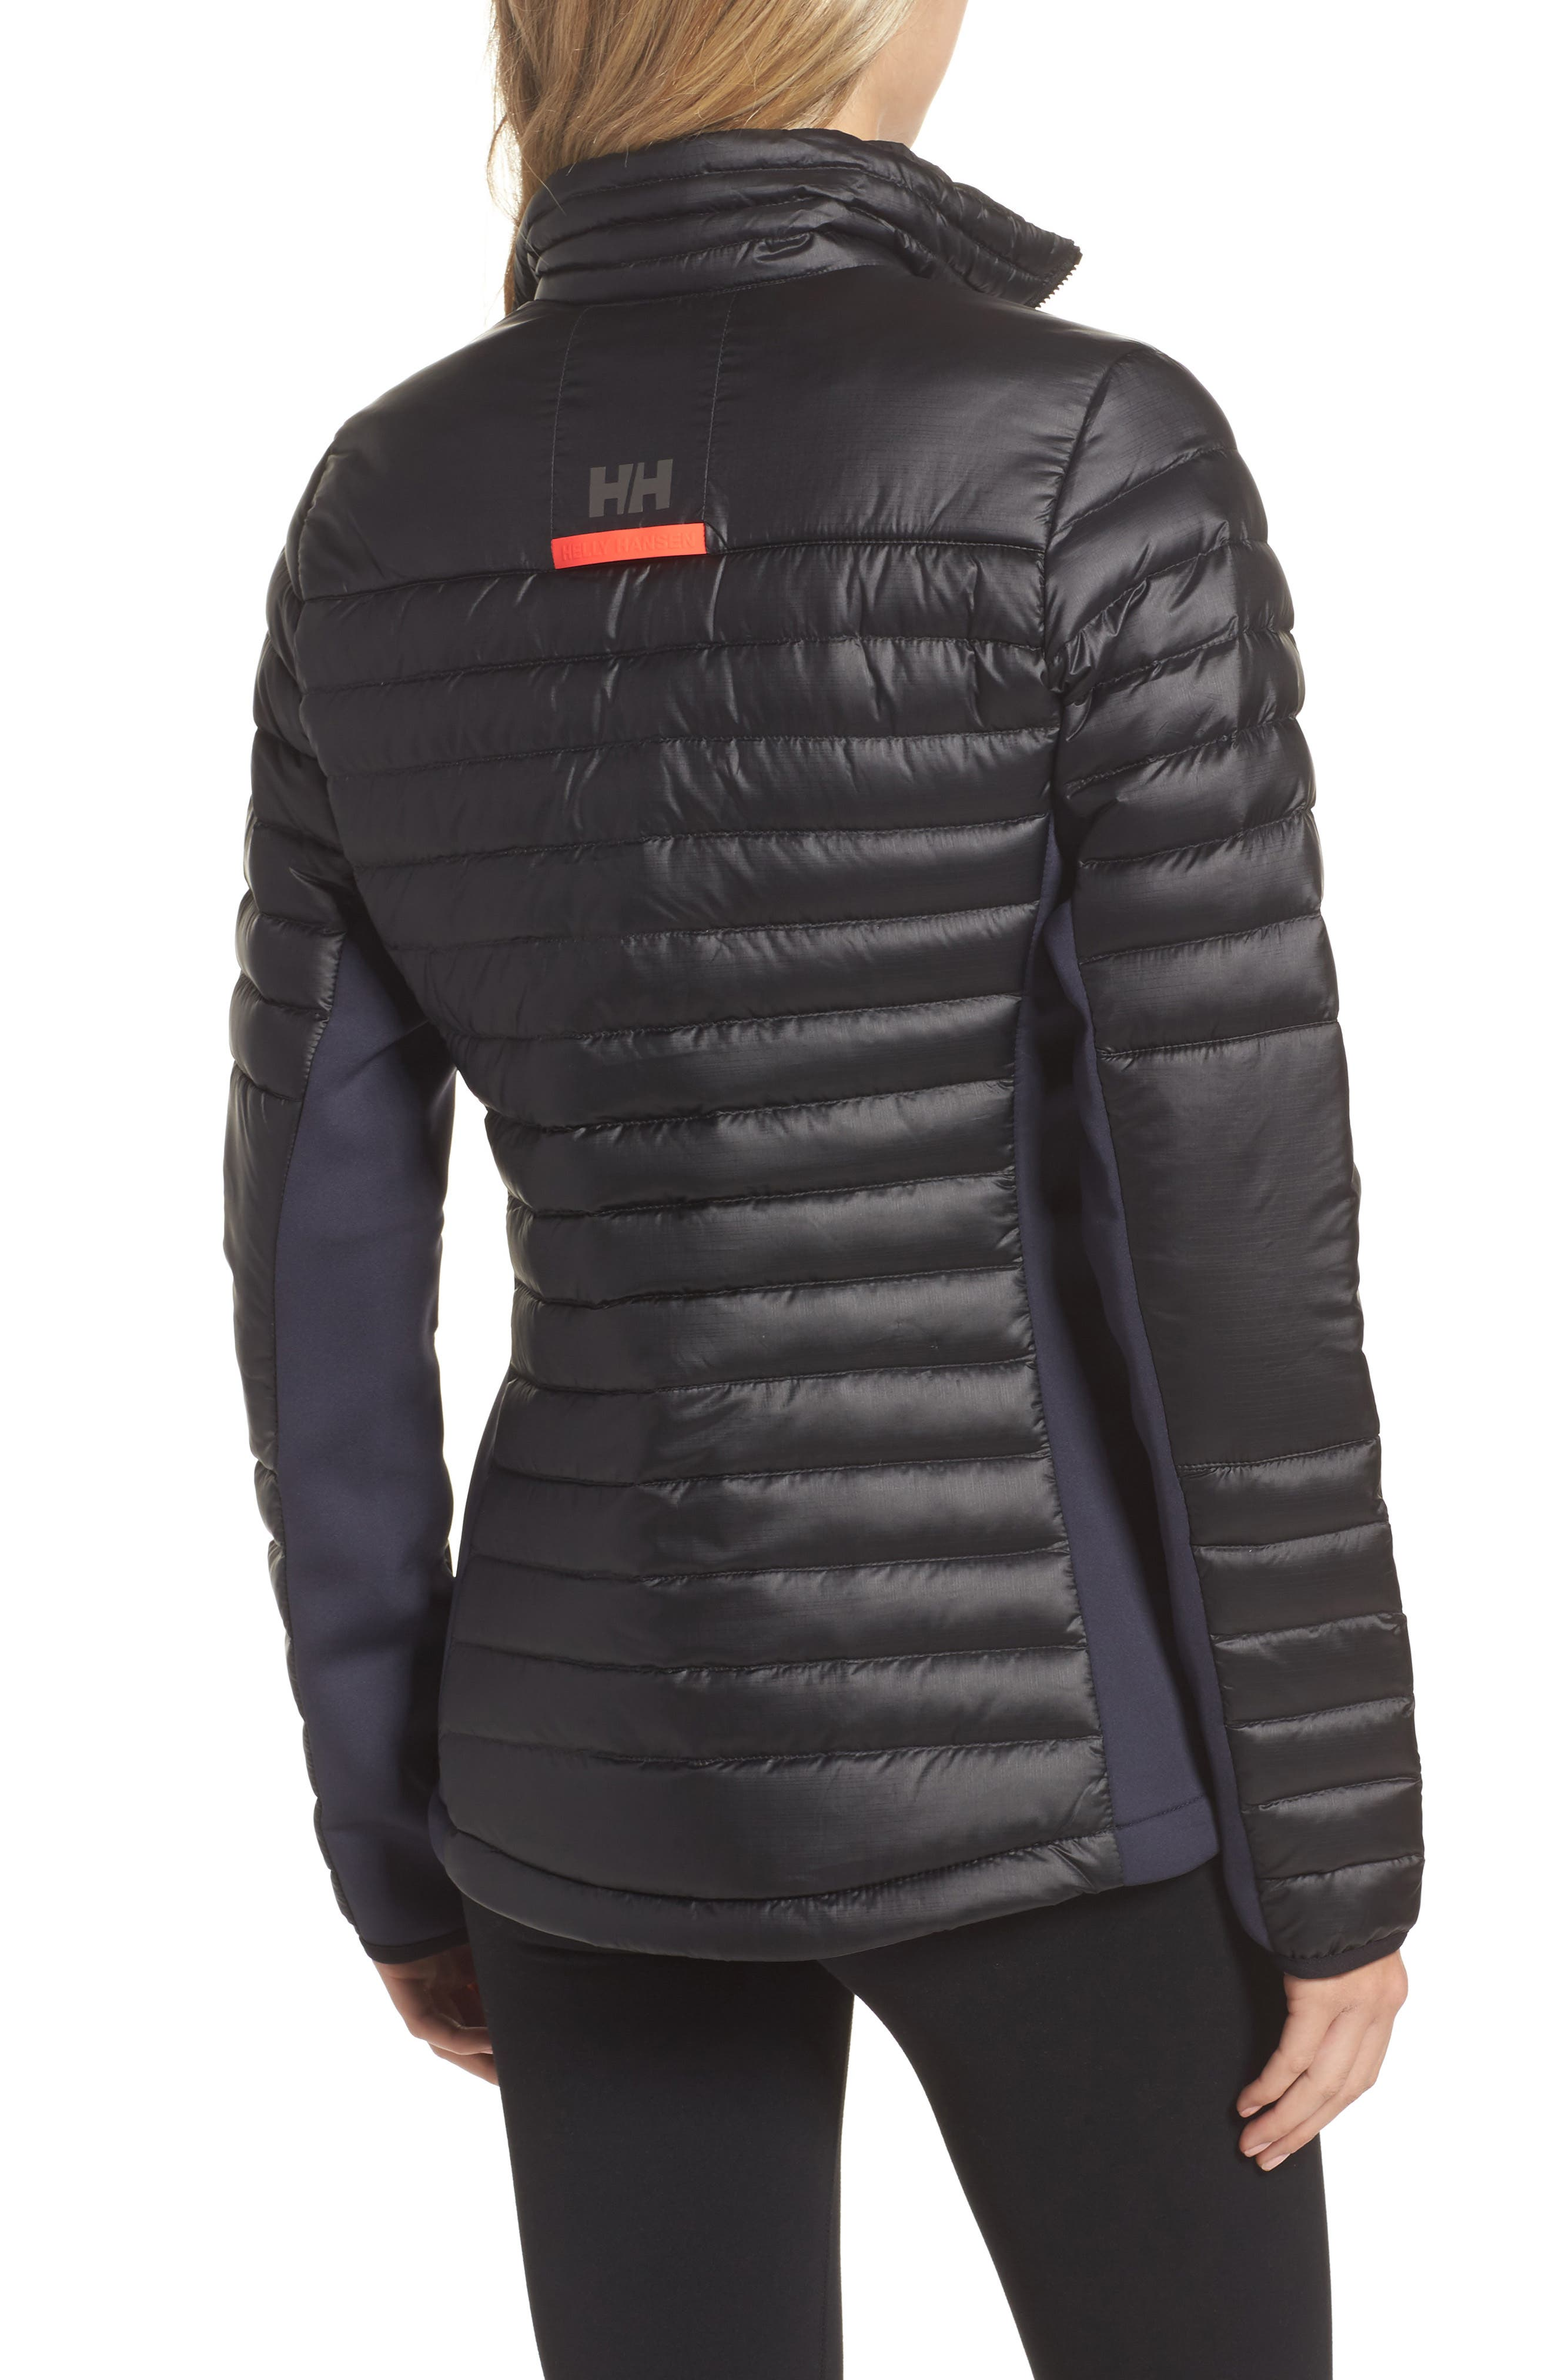 Verglas Hybrid Down Insulator Jacket,                             Alternate thumbnail 2, color,                             001